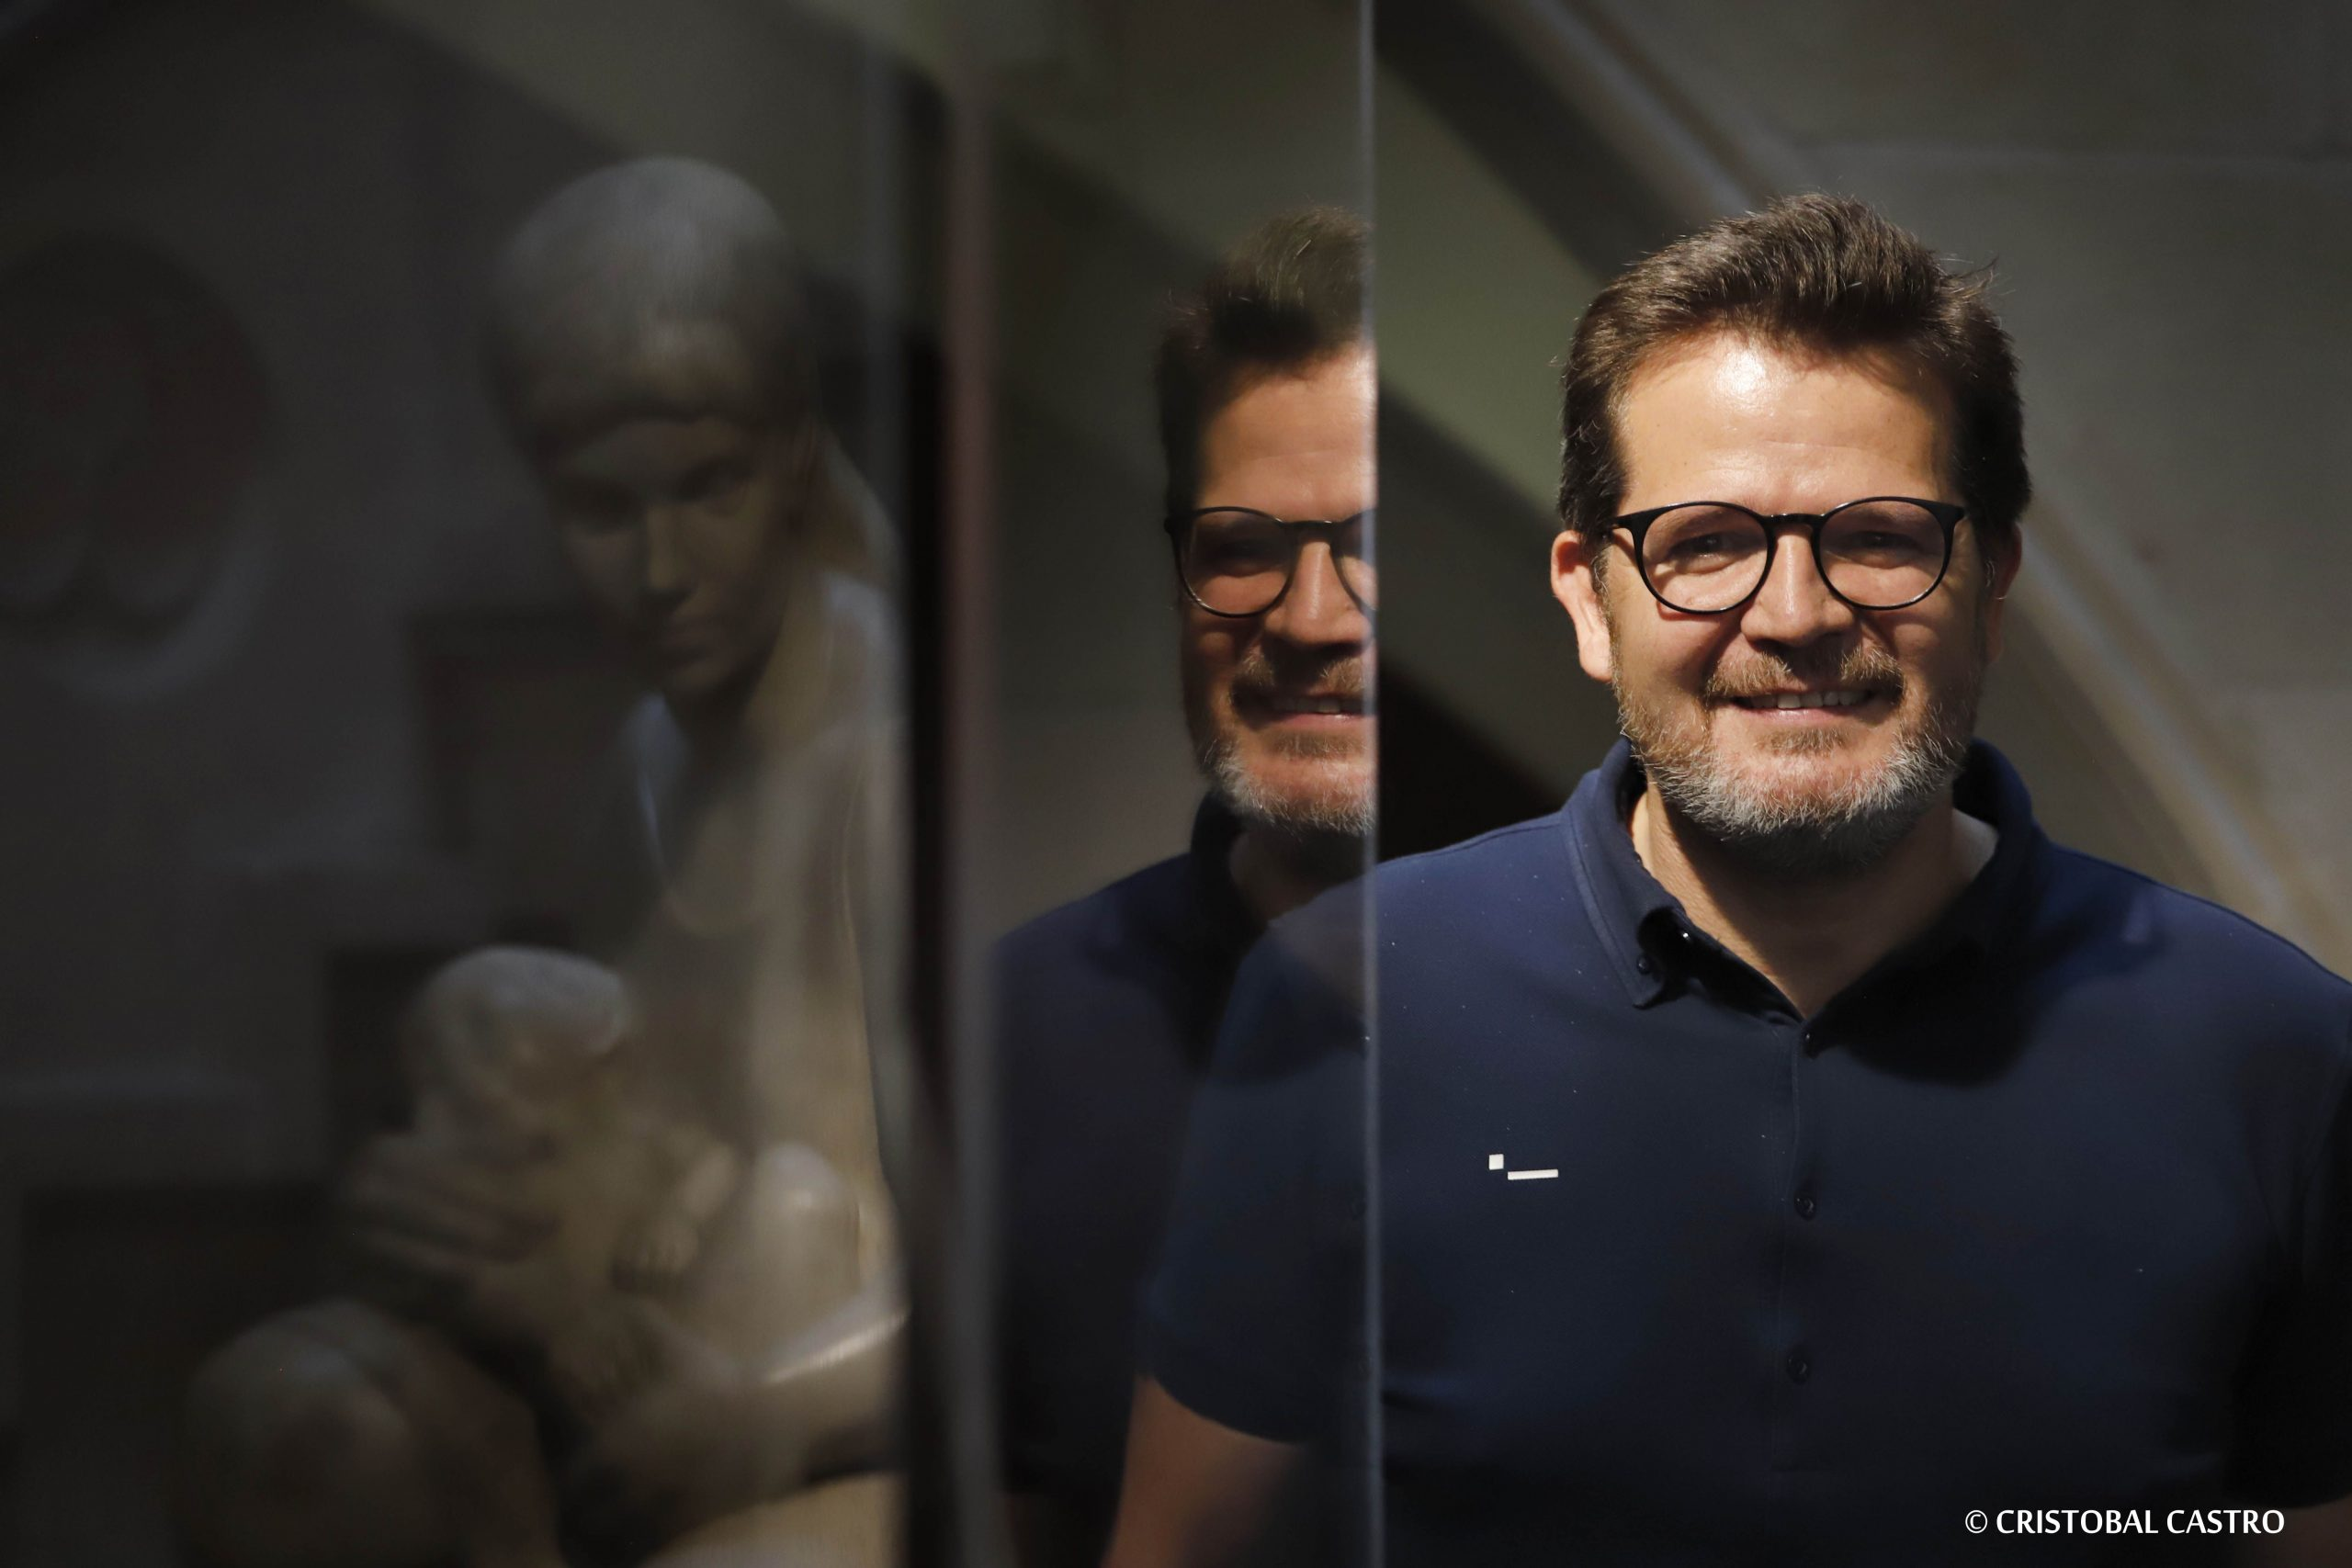 Isaac Albert/Cristóbal Castro